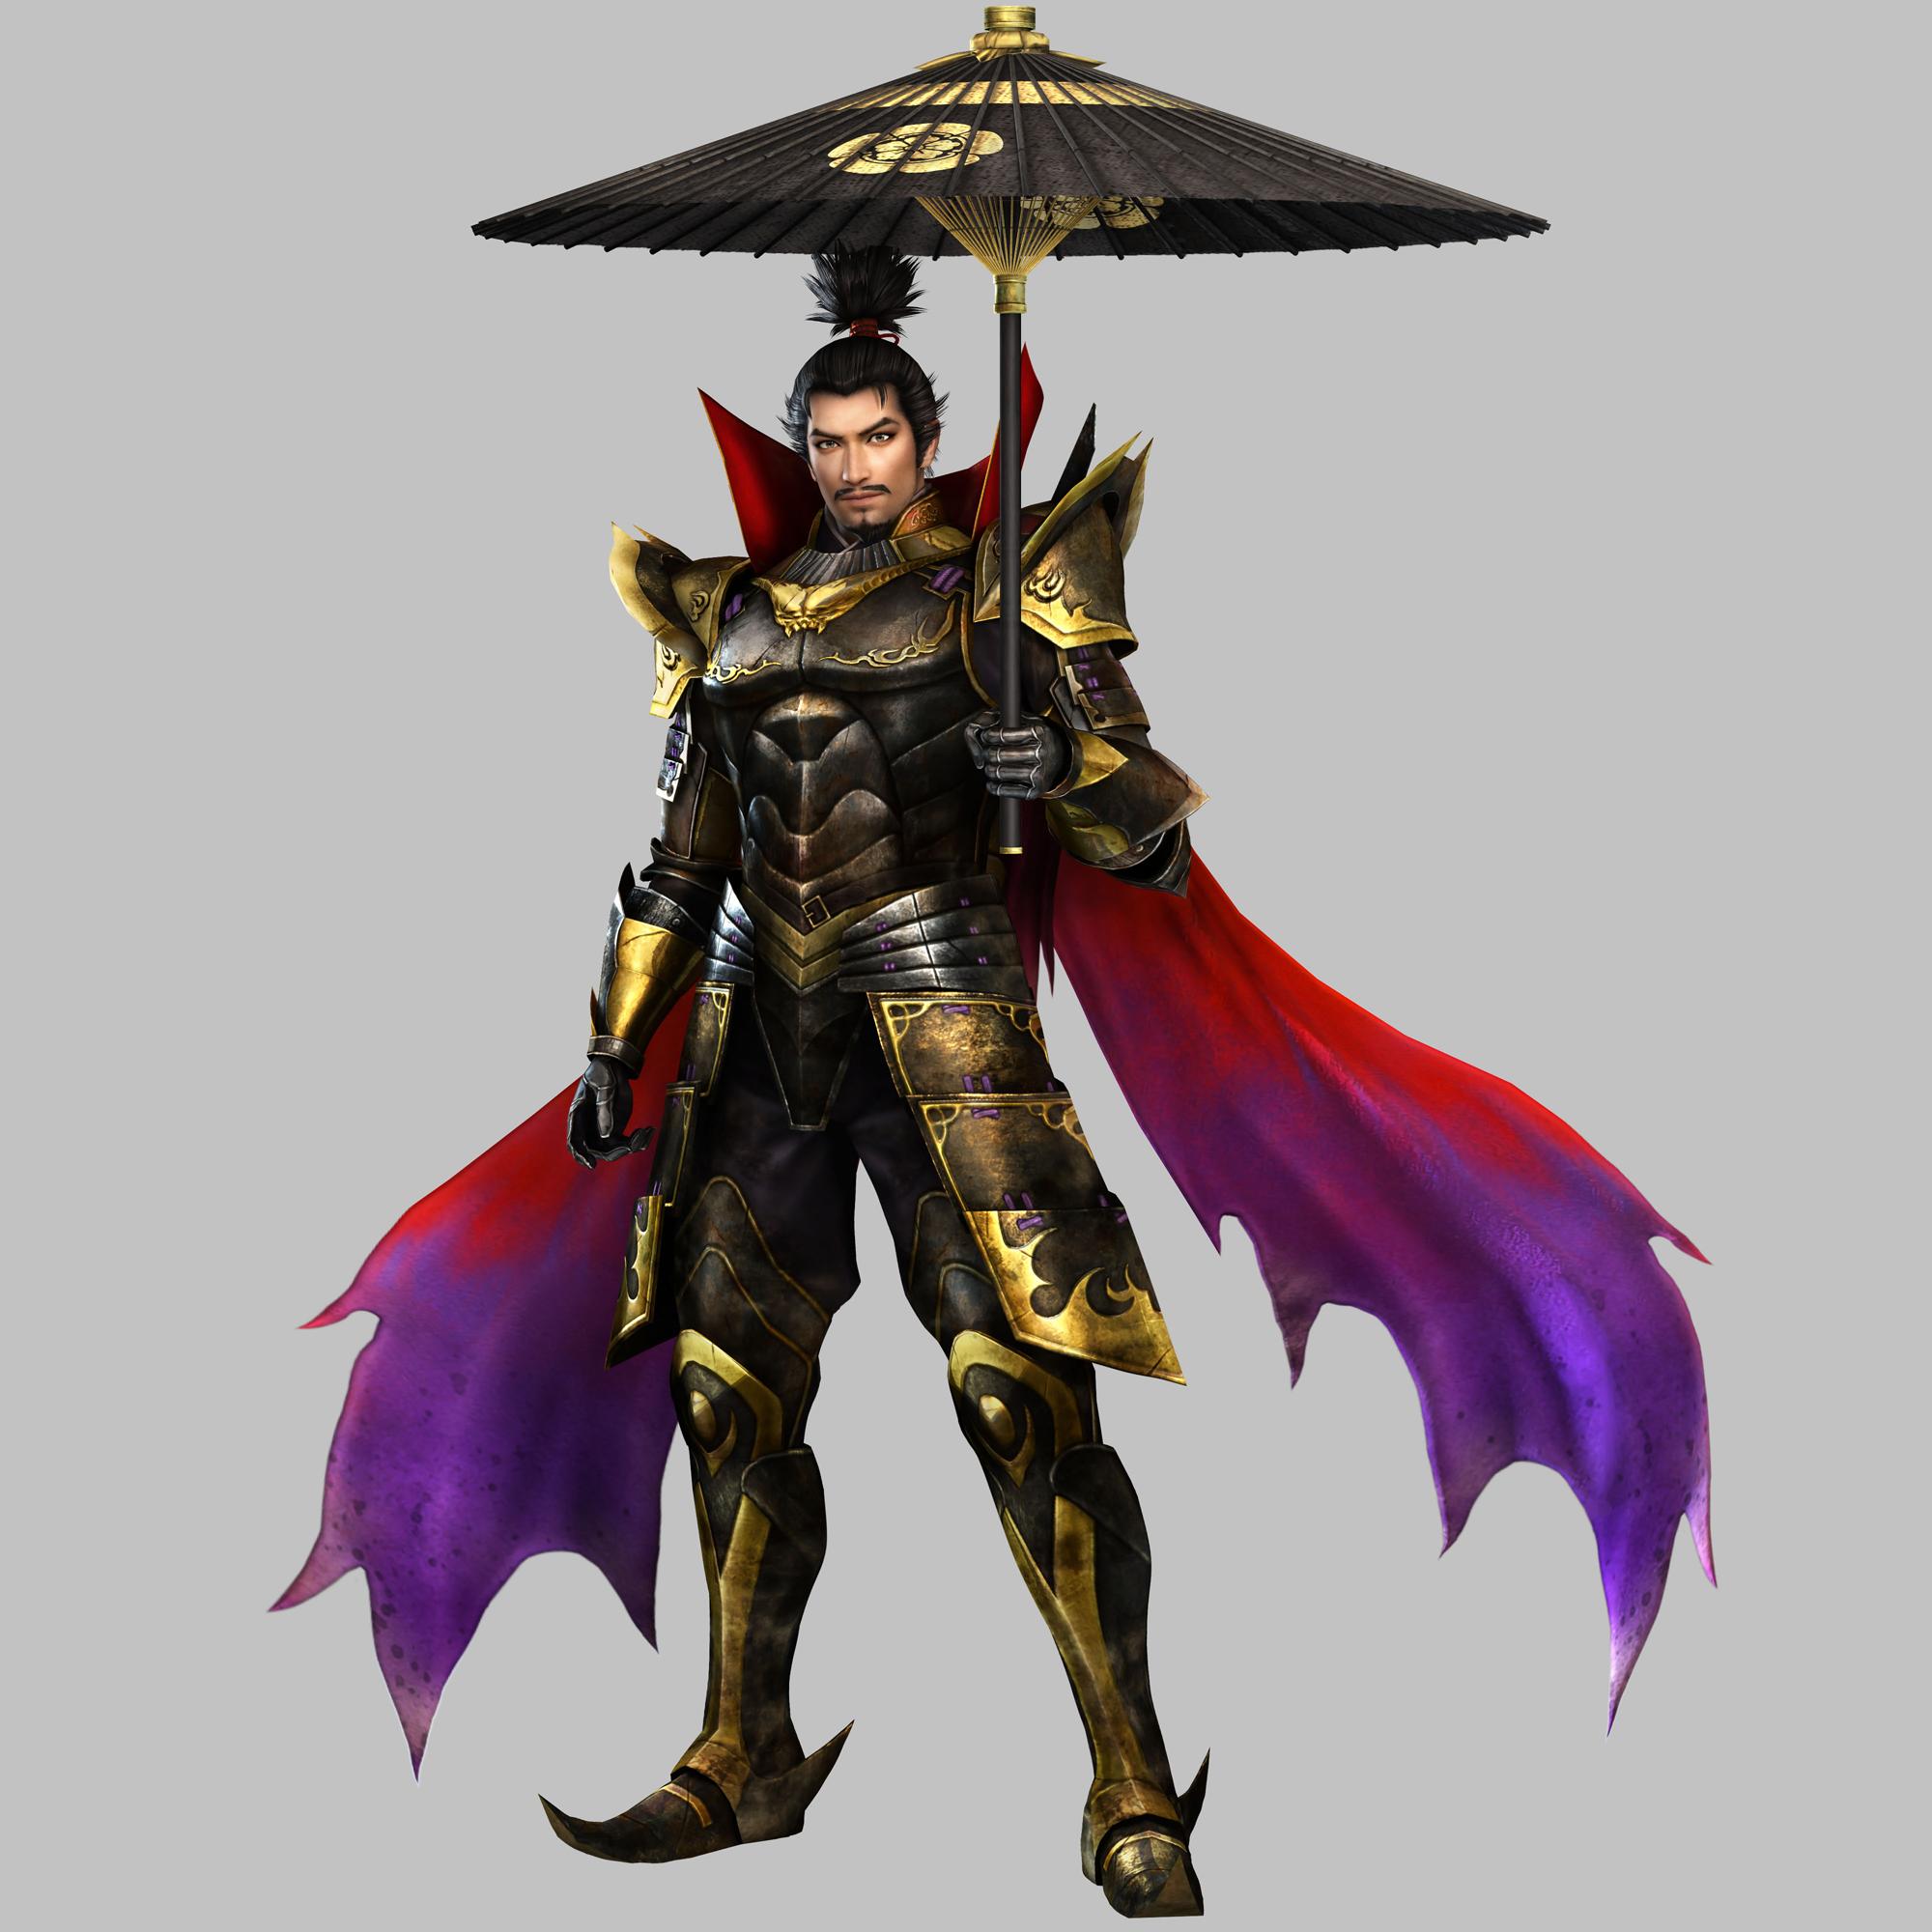 Warriors Orochi 3 Ultimate Nobunaga Oda: Image - Nobunaga Oda Gifu Collaboration (SW4).png